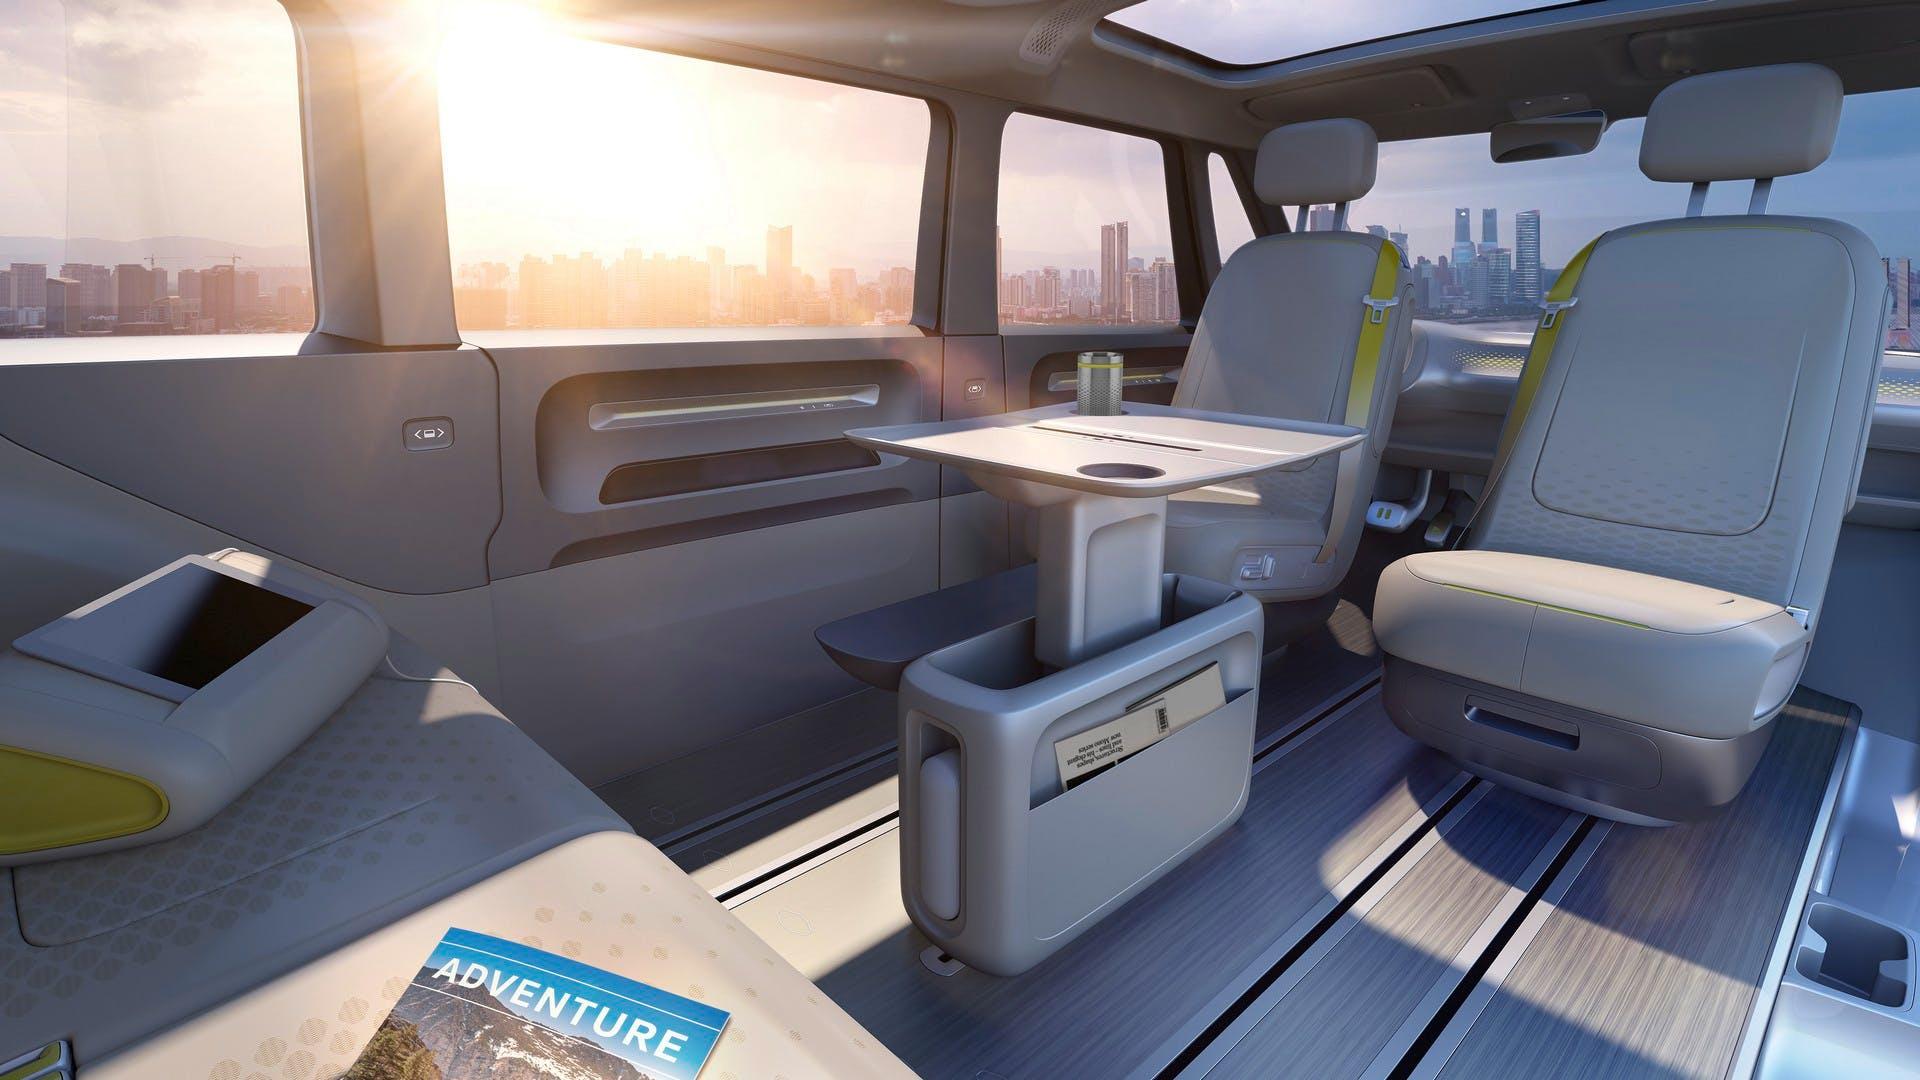 Volkswagen Bulli Concept interni